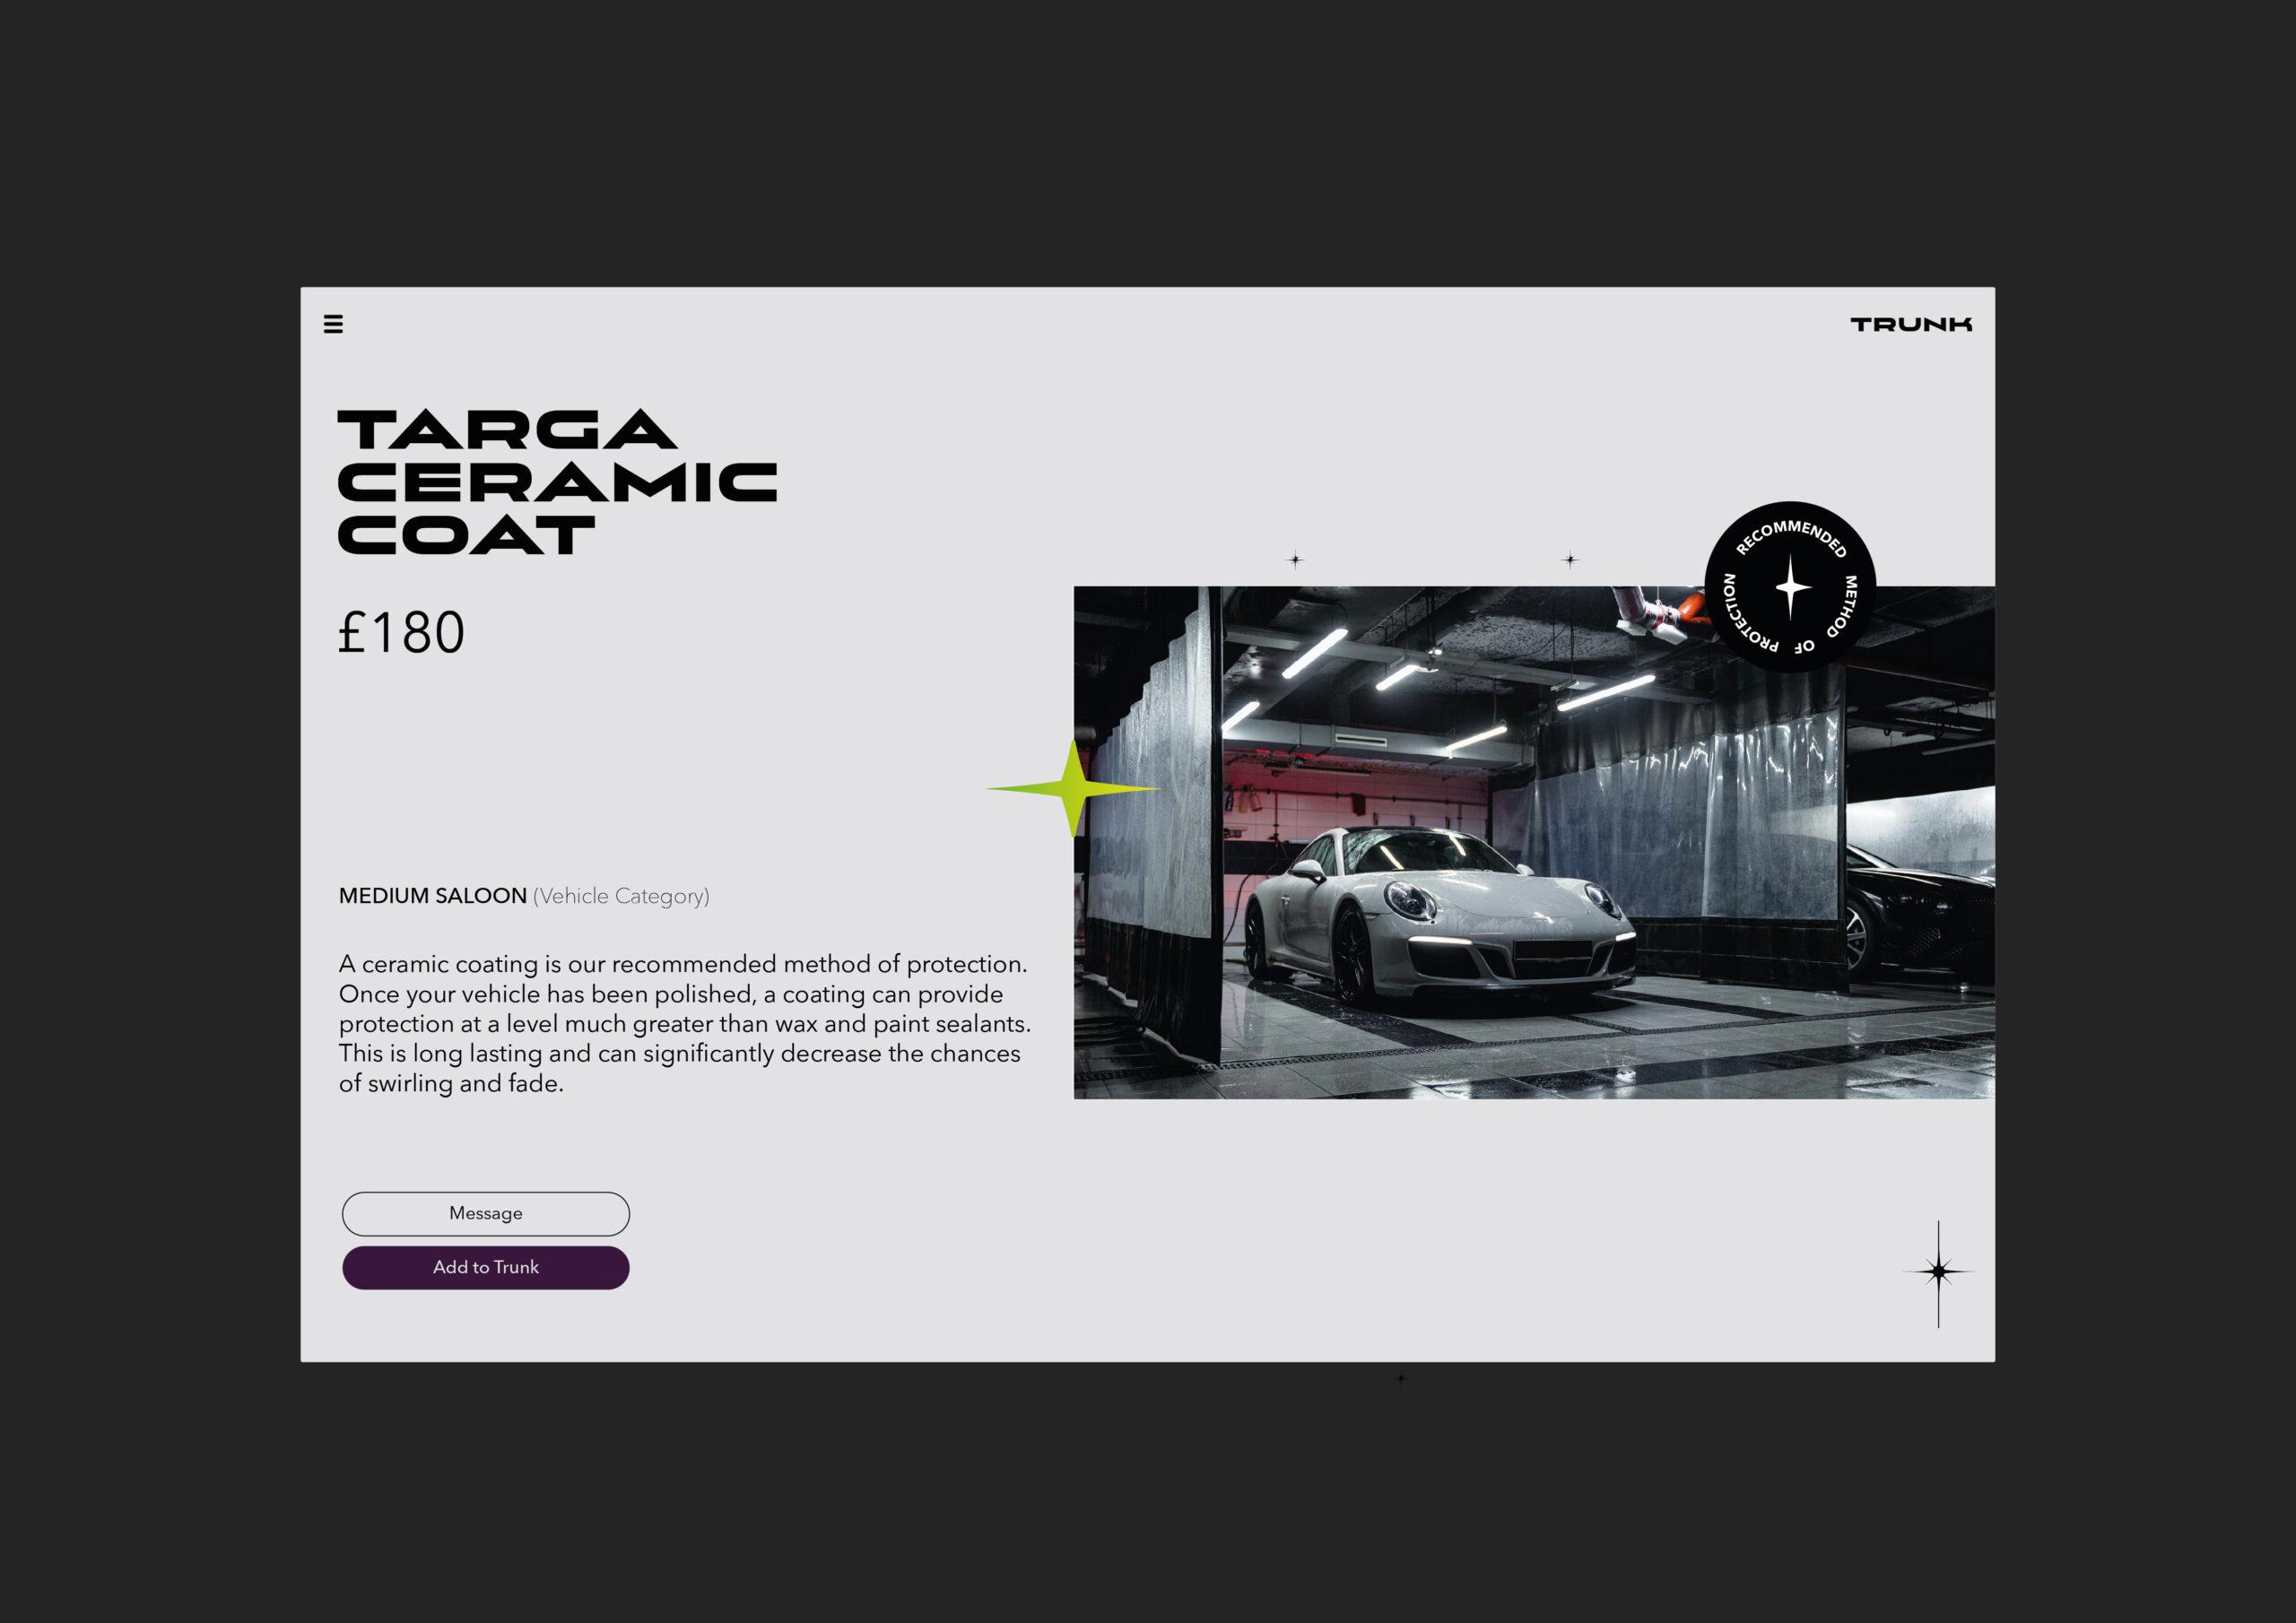 TARGA1-07-07-06